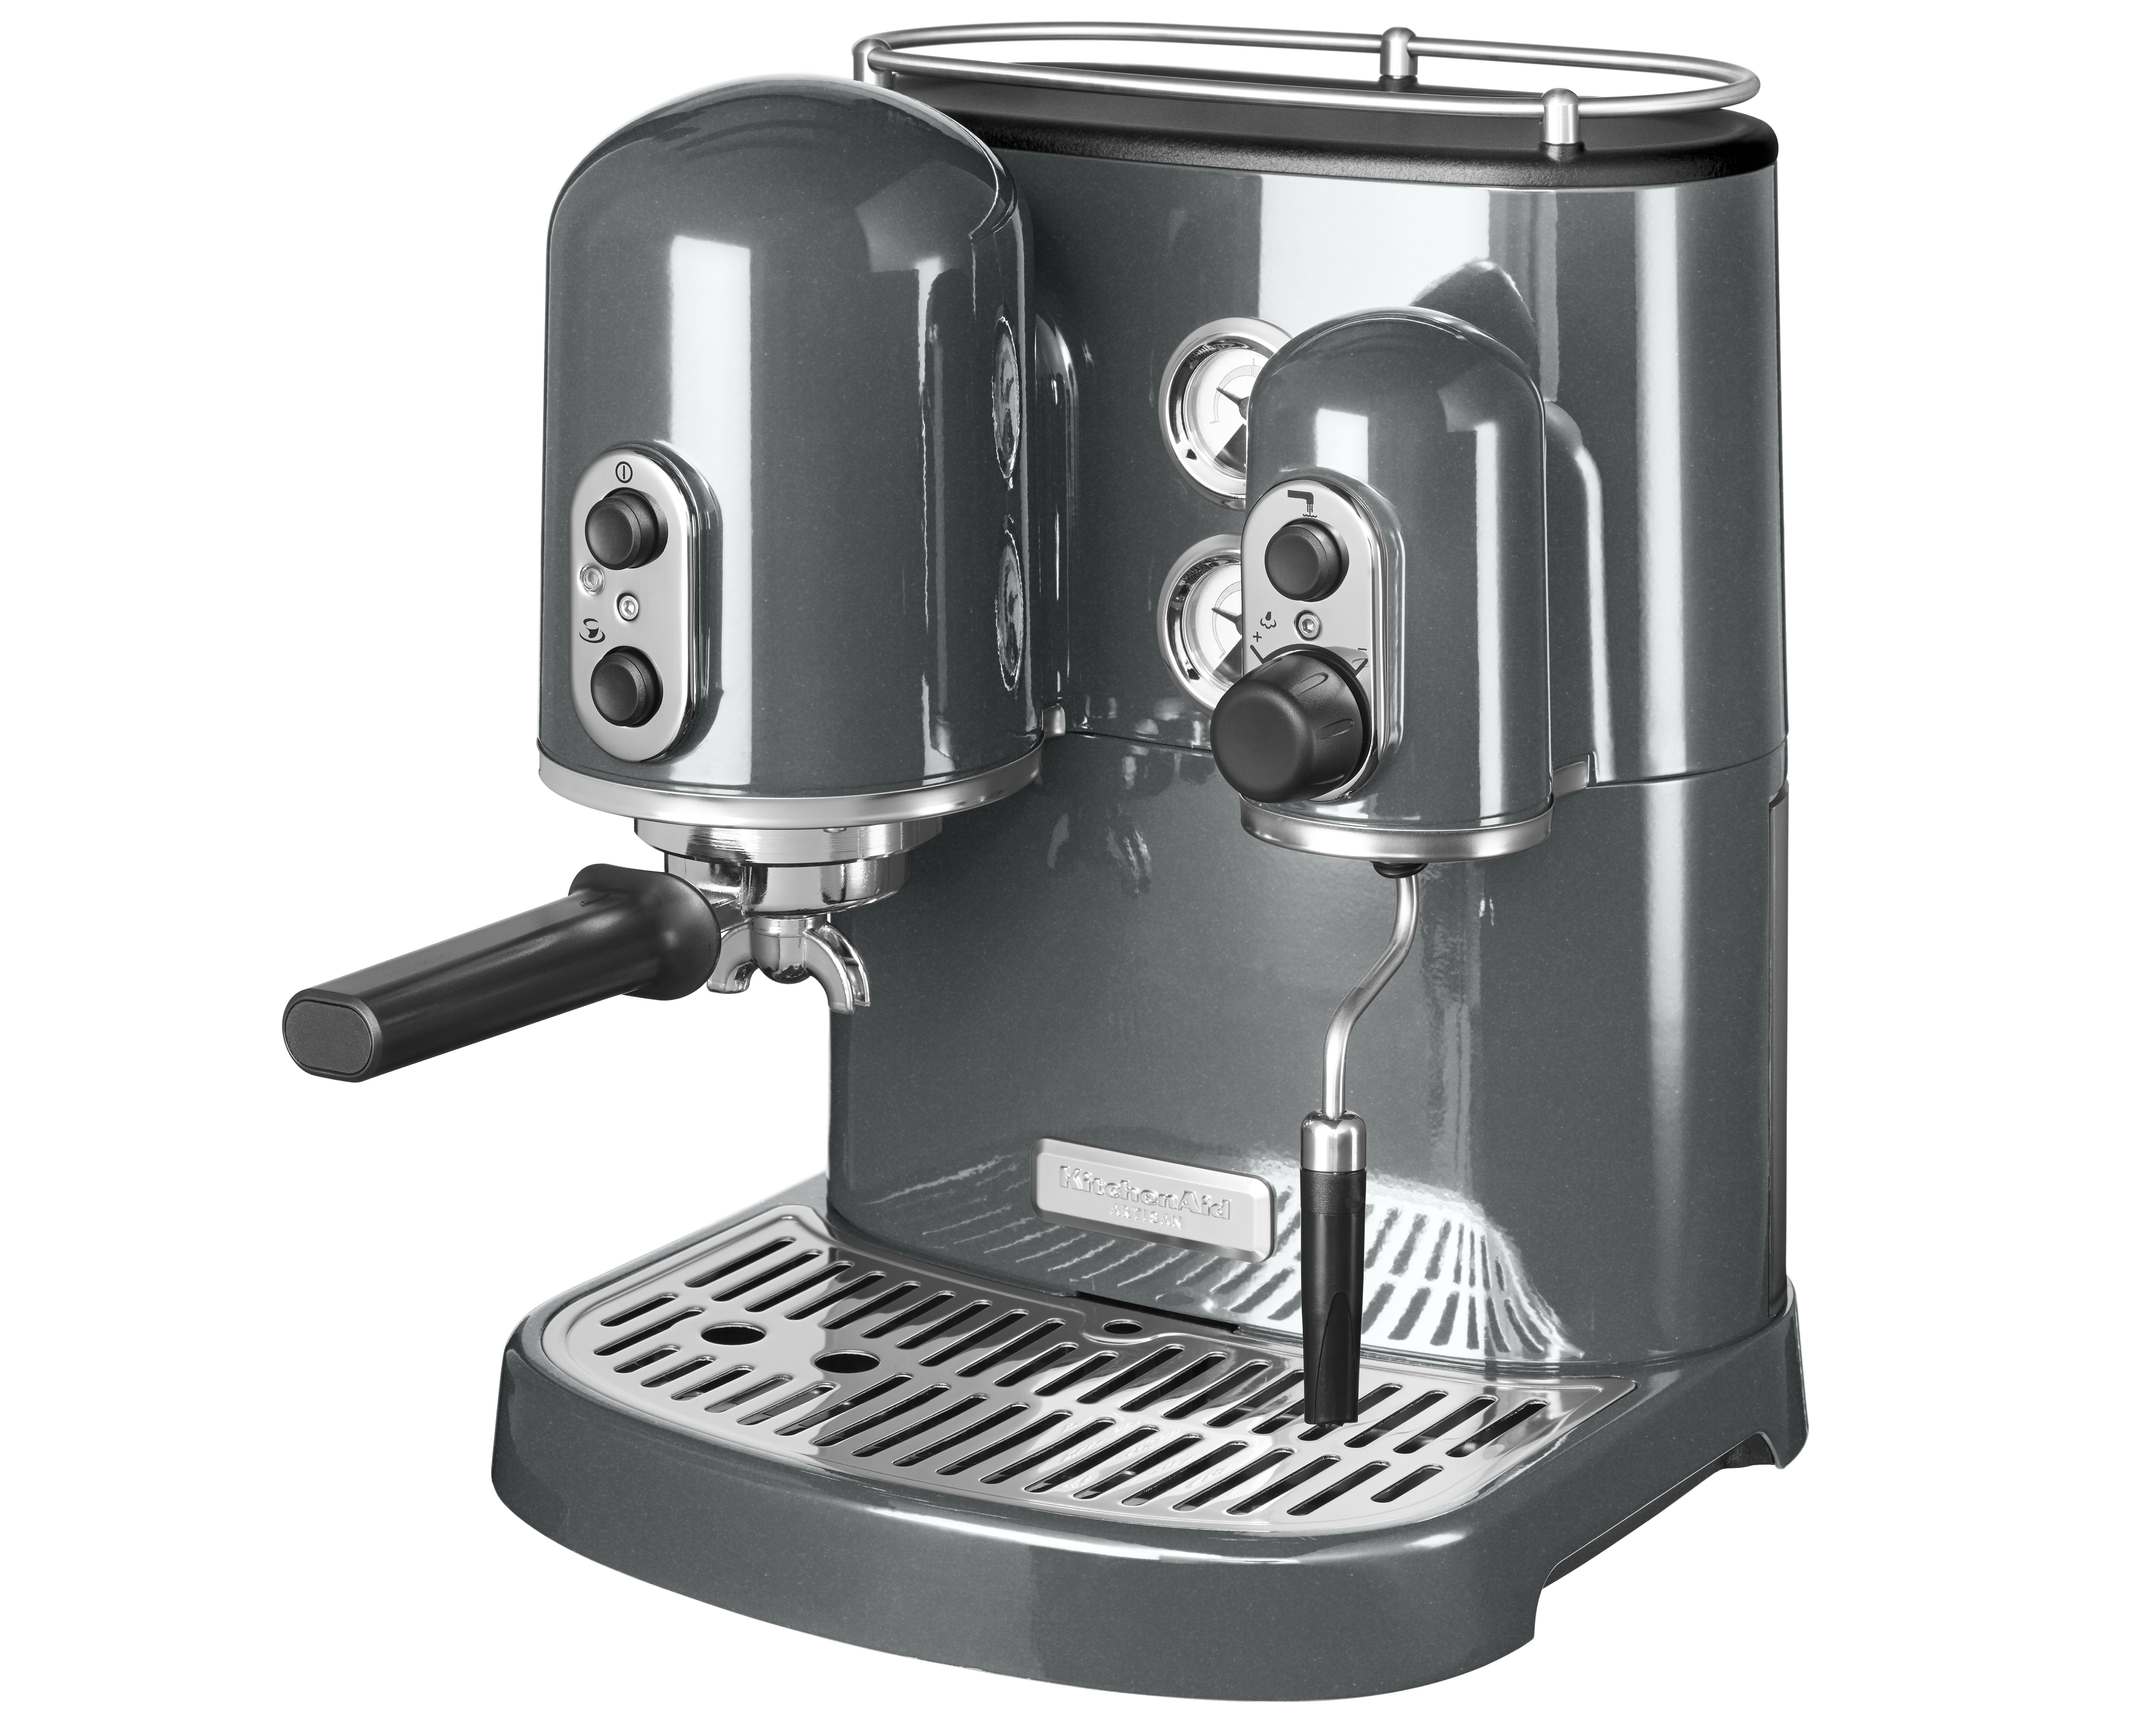 KA Artisan Espressomaskin Grafit Metallic